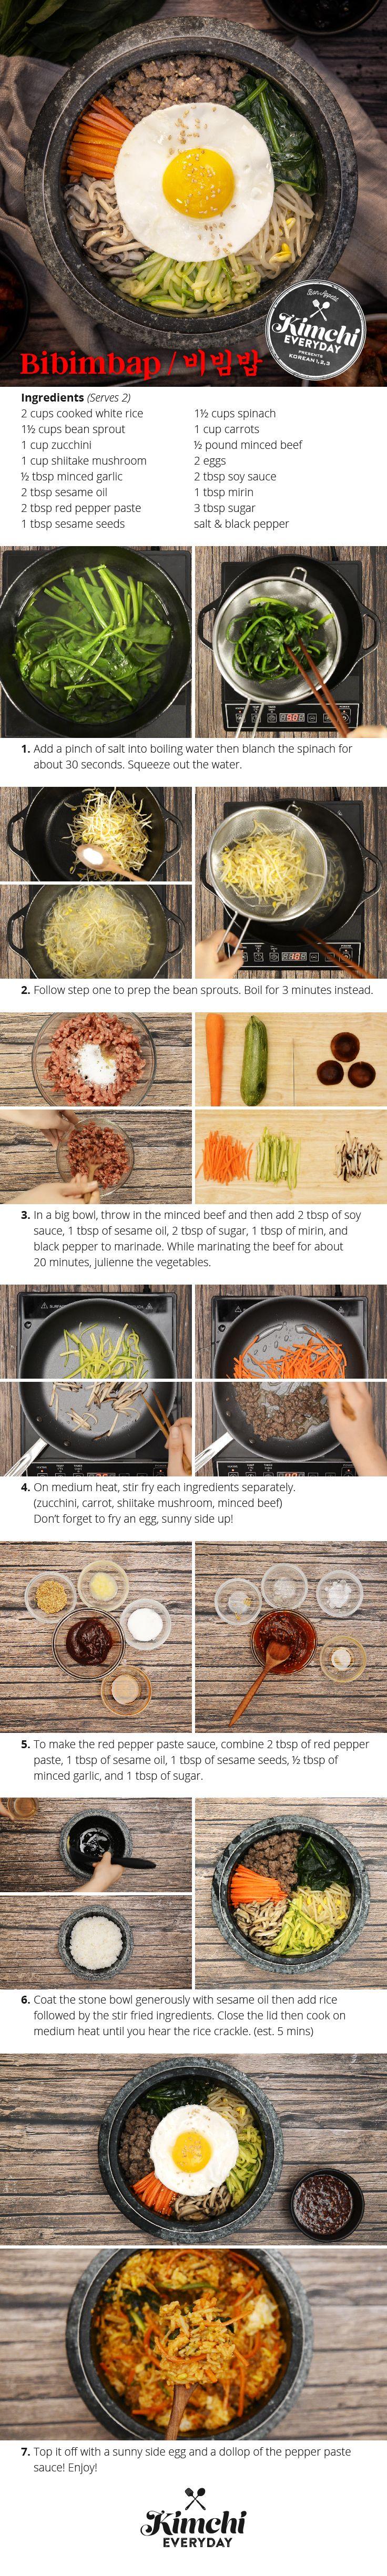 Kimchi Everyday season 2 is here! We're kicking off the new season with Korea's iconinc dish, bibimbap!